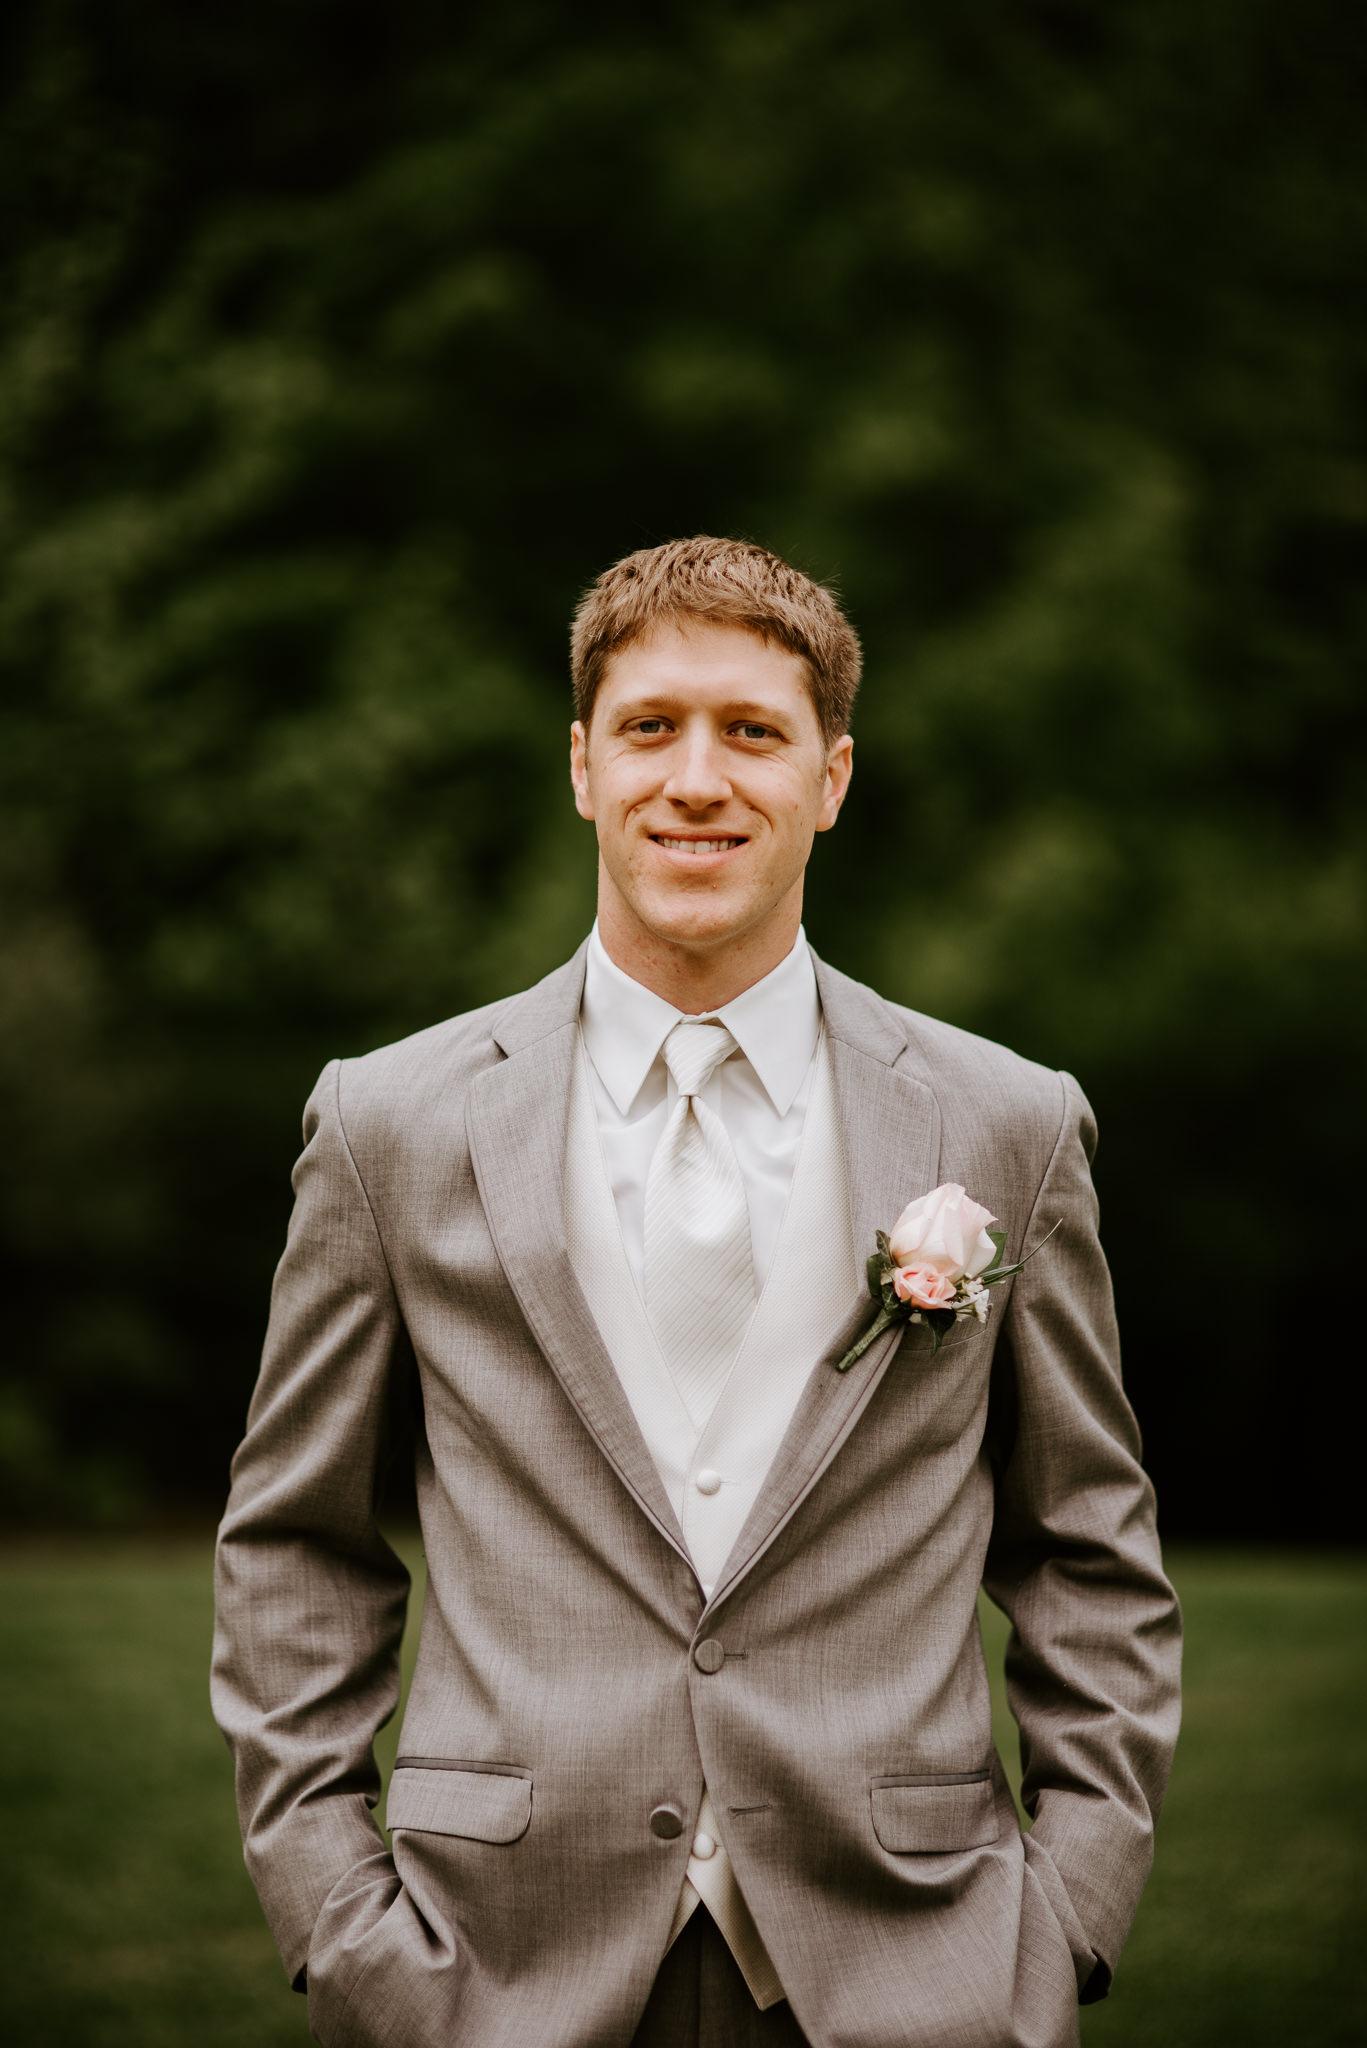 House Mountain Inn - Weddings - Lexington - Virginia - Best Wedding Photographer - Pat Cori Photography-54.jpg